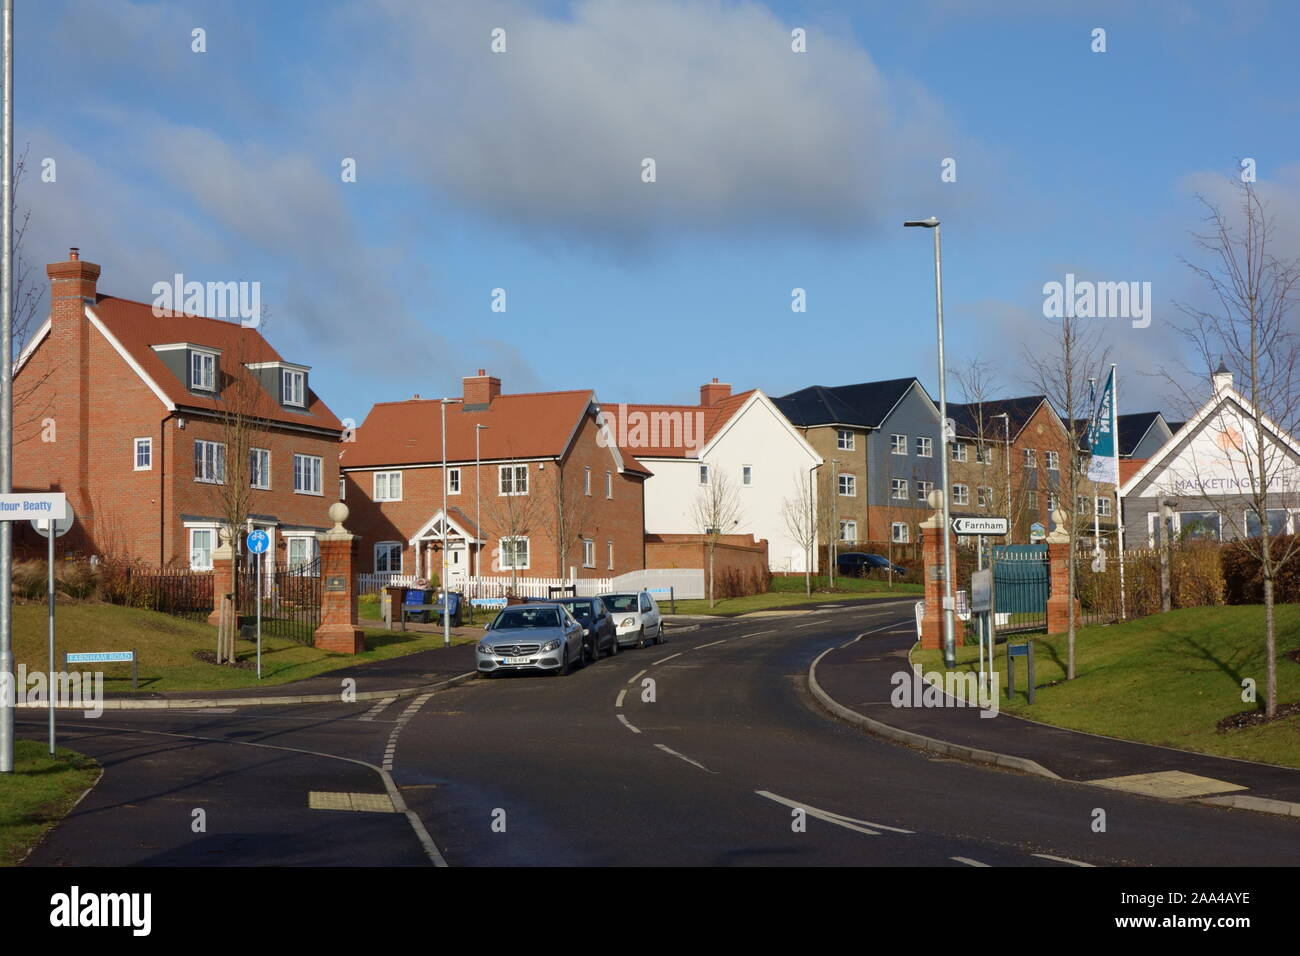 st michaels hurst new build housing development employment land, shops, community facilities in Bishops Stortford, Hertfordshire, England Stock Photo